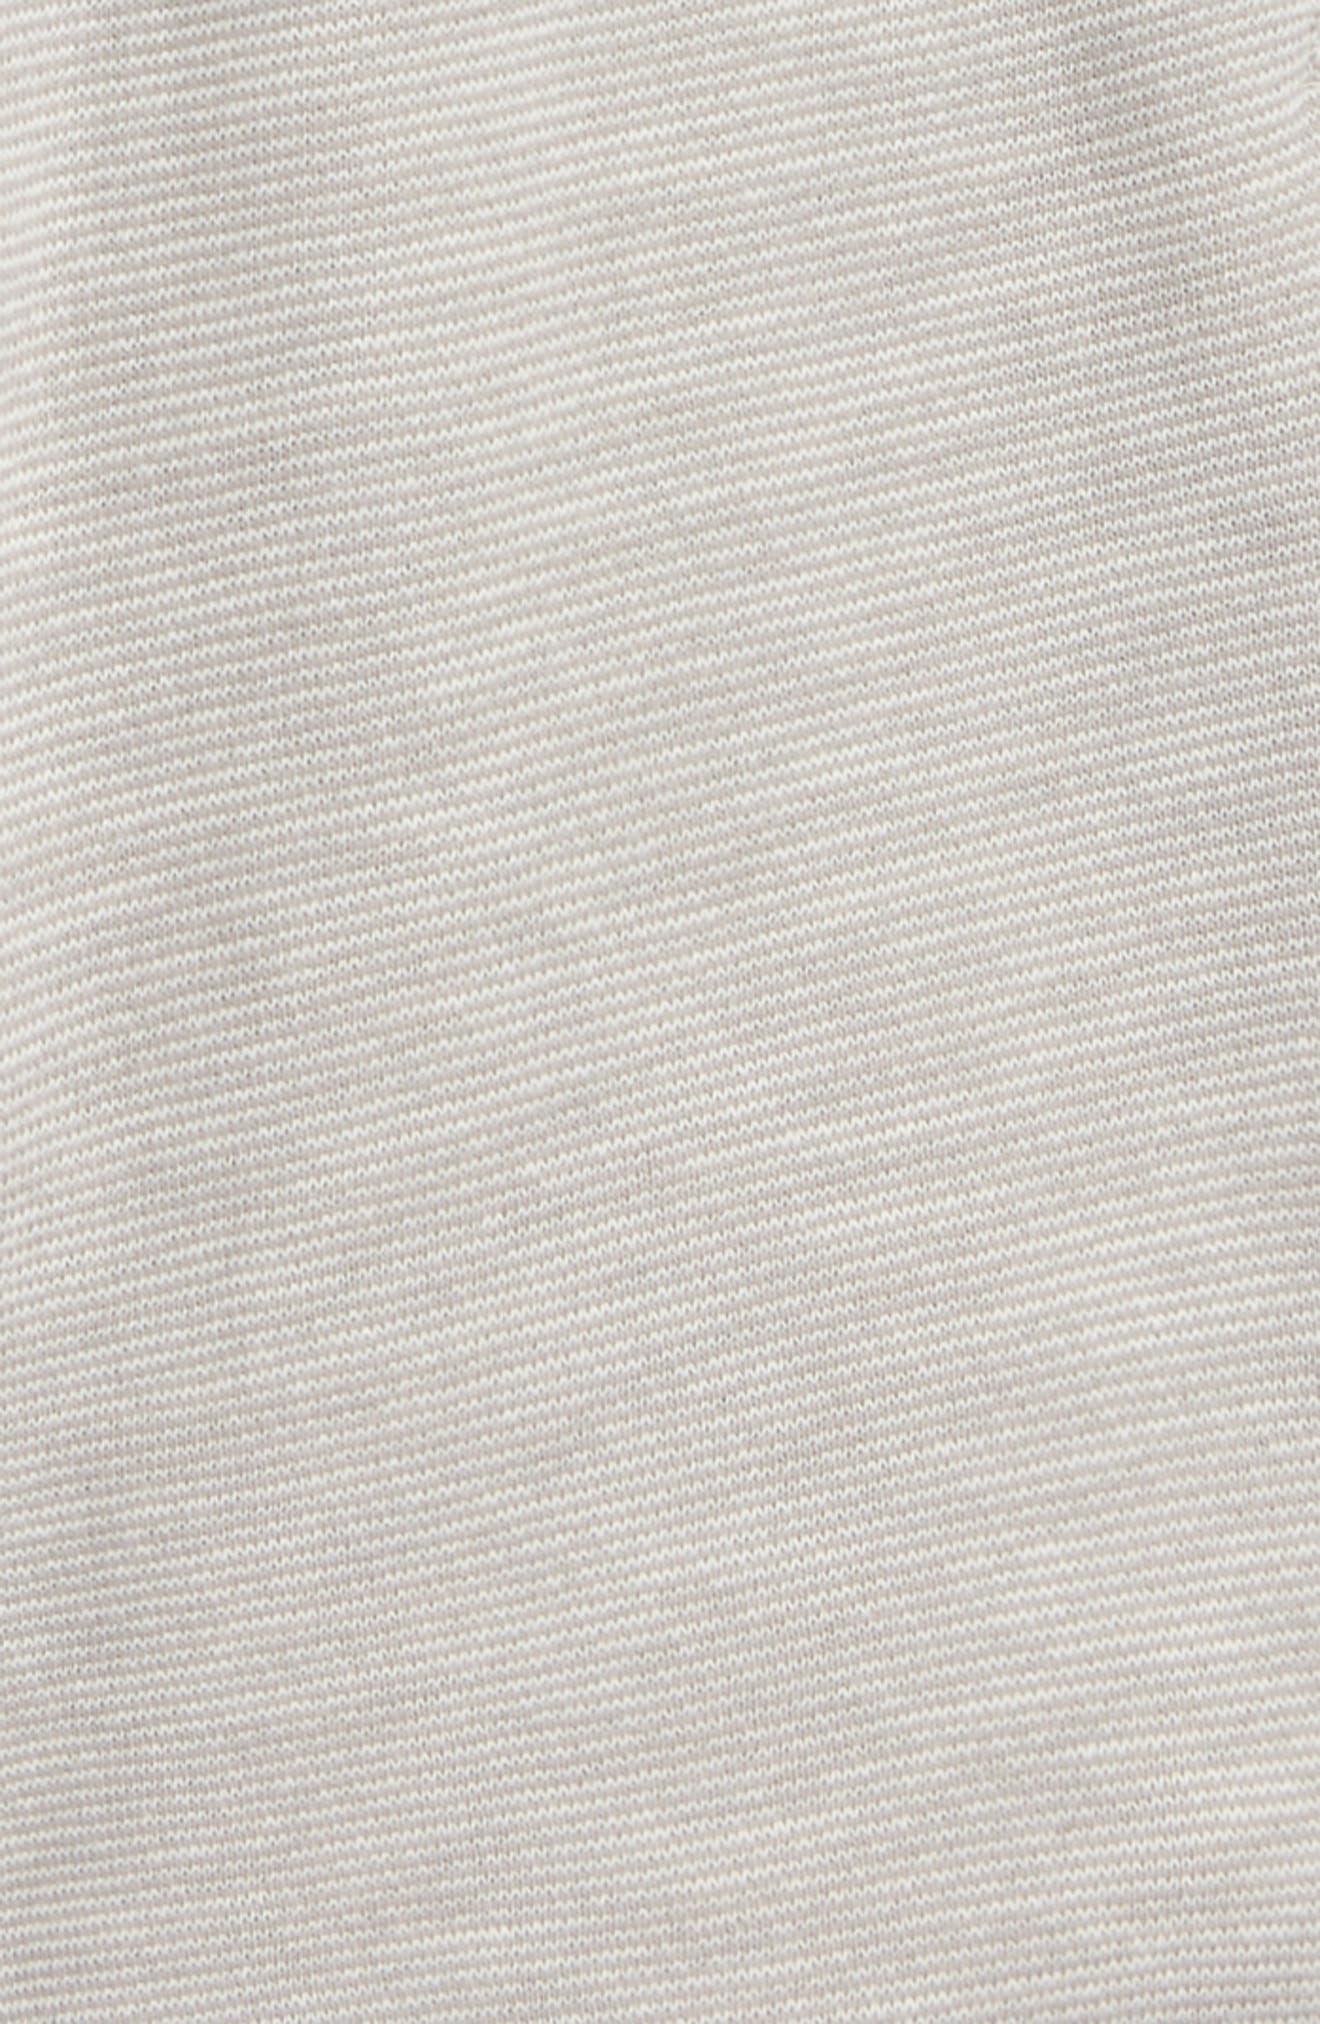 BILLABONG,                             Balance Shorts,                             Alternate thumbnail 2, color,                             OATMEAL